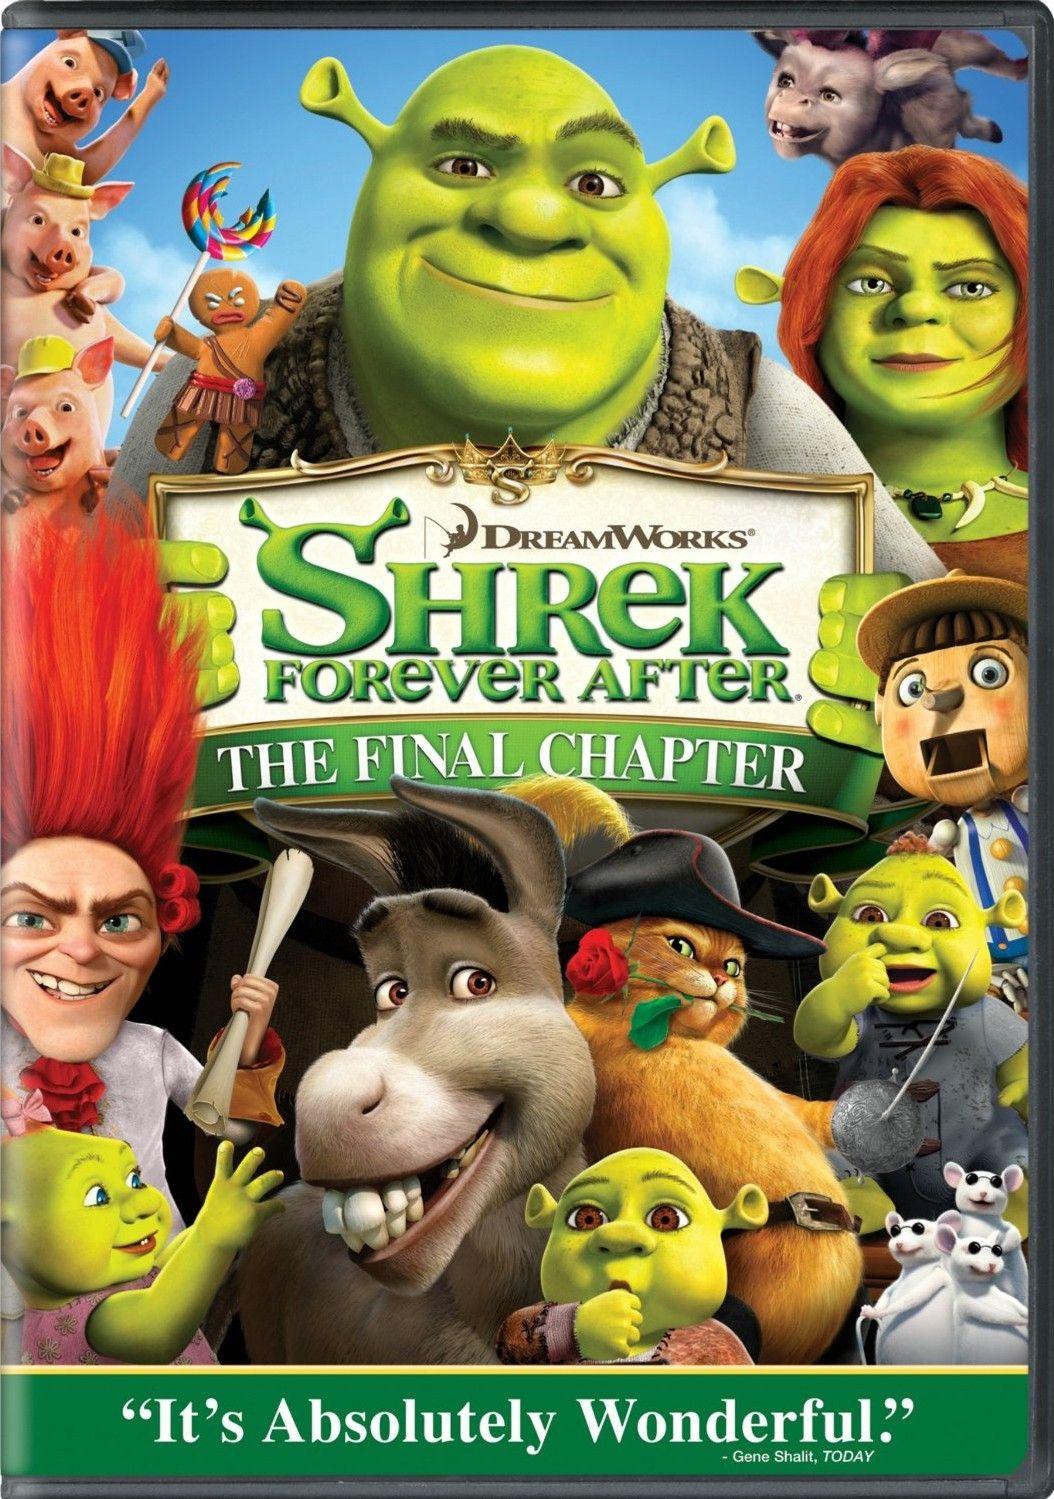 La 4ta 2010 Shrek Fiona Y Shrek Shrek Felices Para Siempre